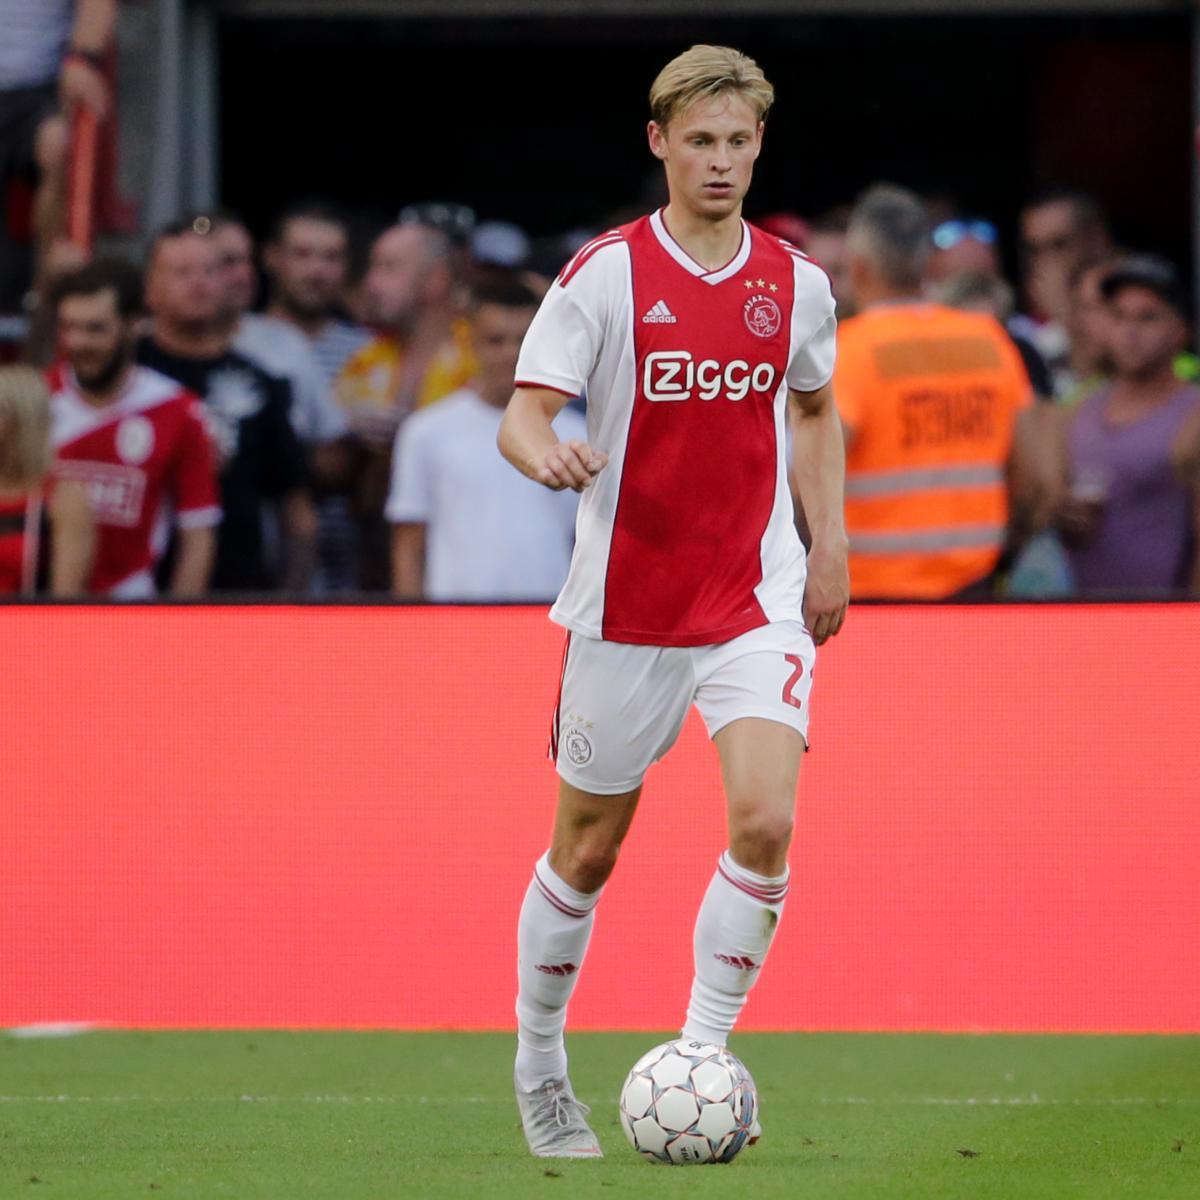 Barcelona Transfer News: Frenkie de Jong Deal Agreed in Latest Rumours